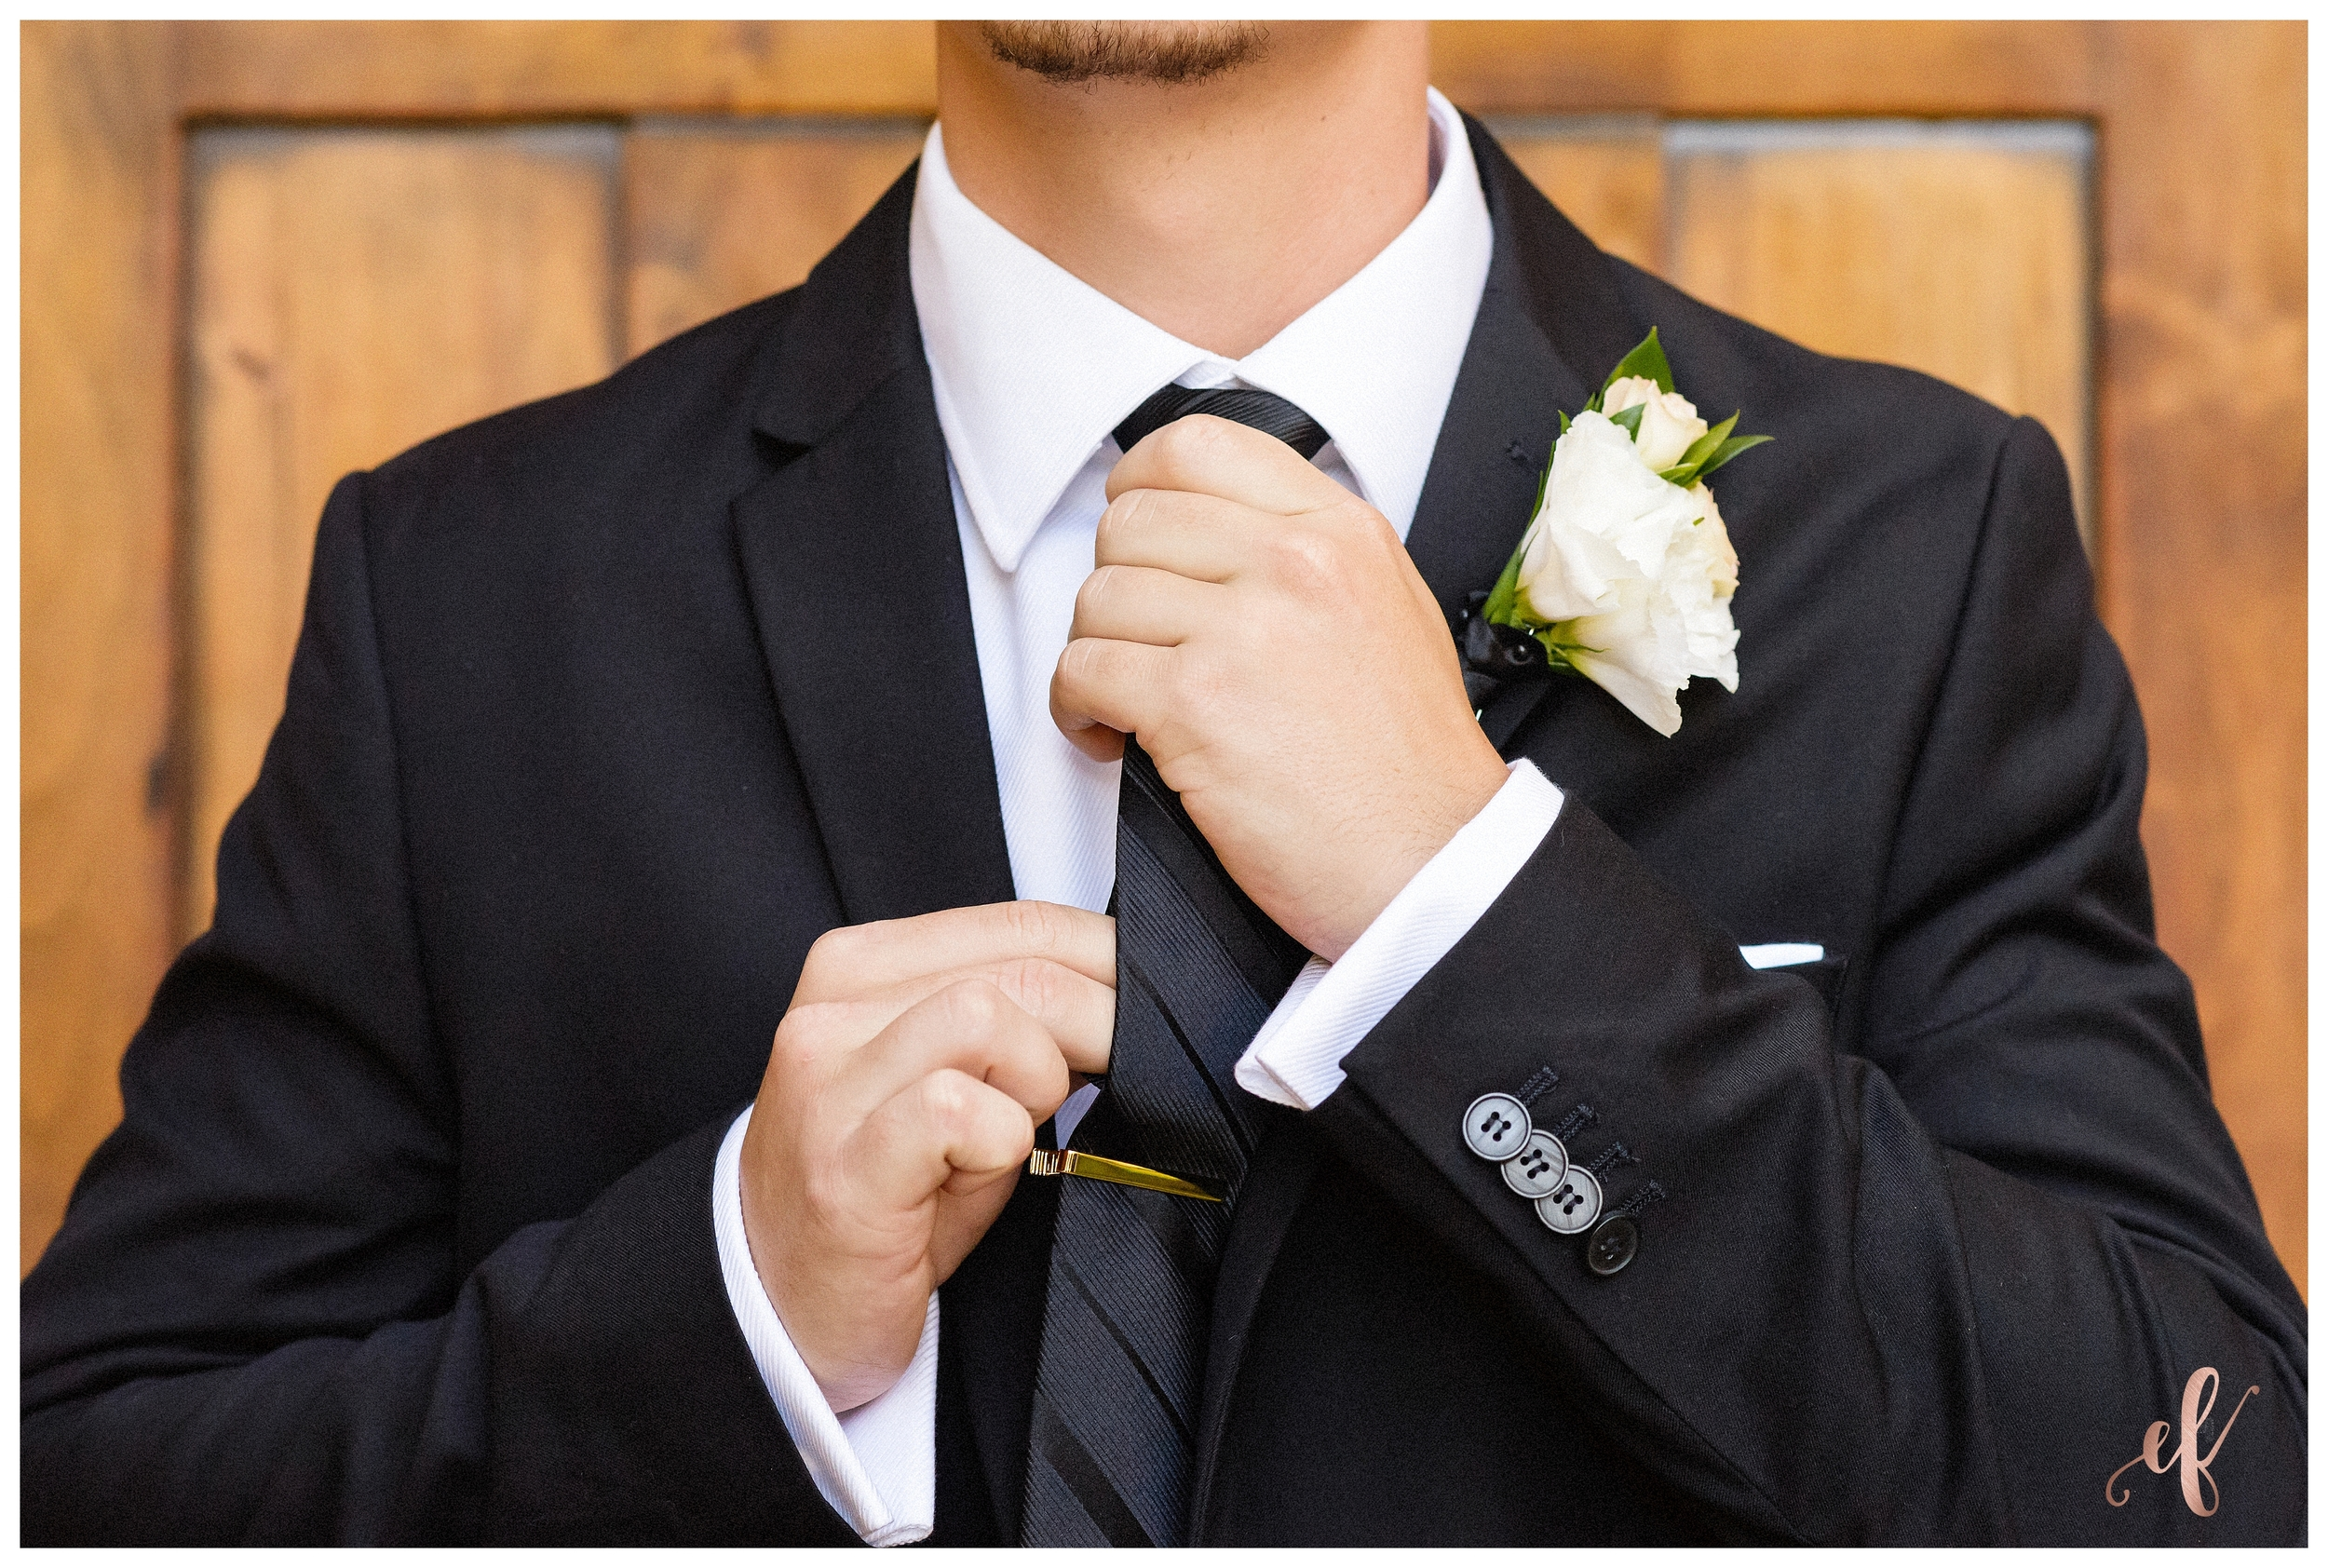 San Diego Wedding Photographer   Ernie & Fiona Photography   Groom   Pose   Tying Tie